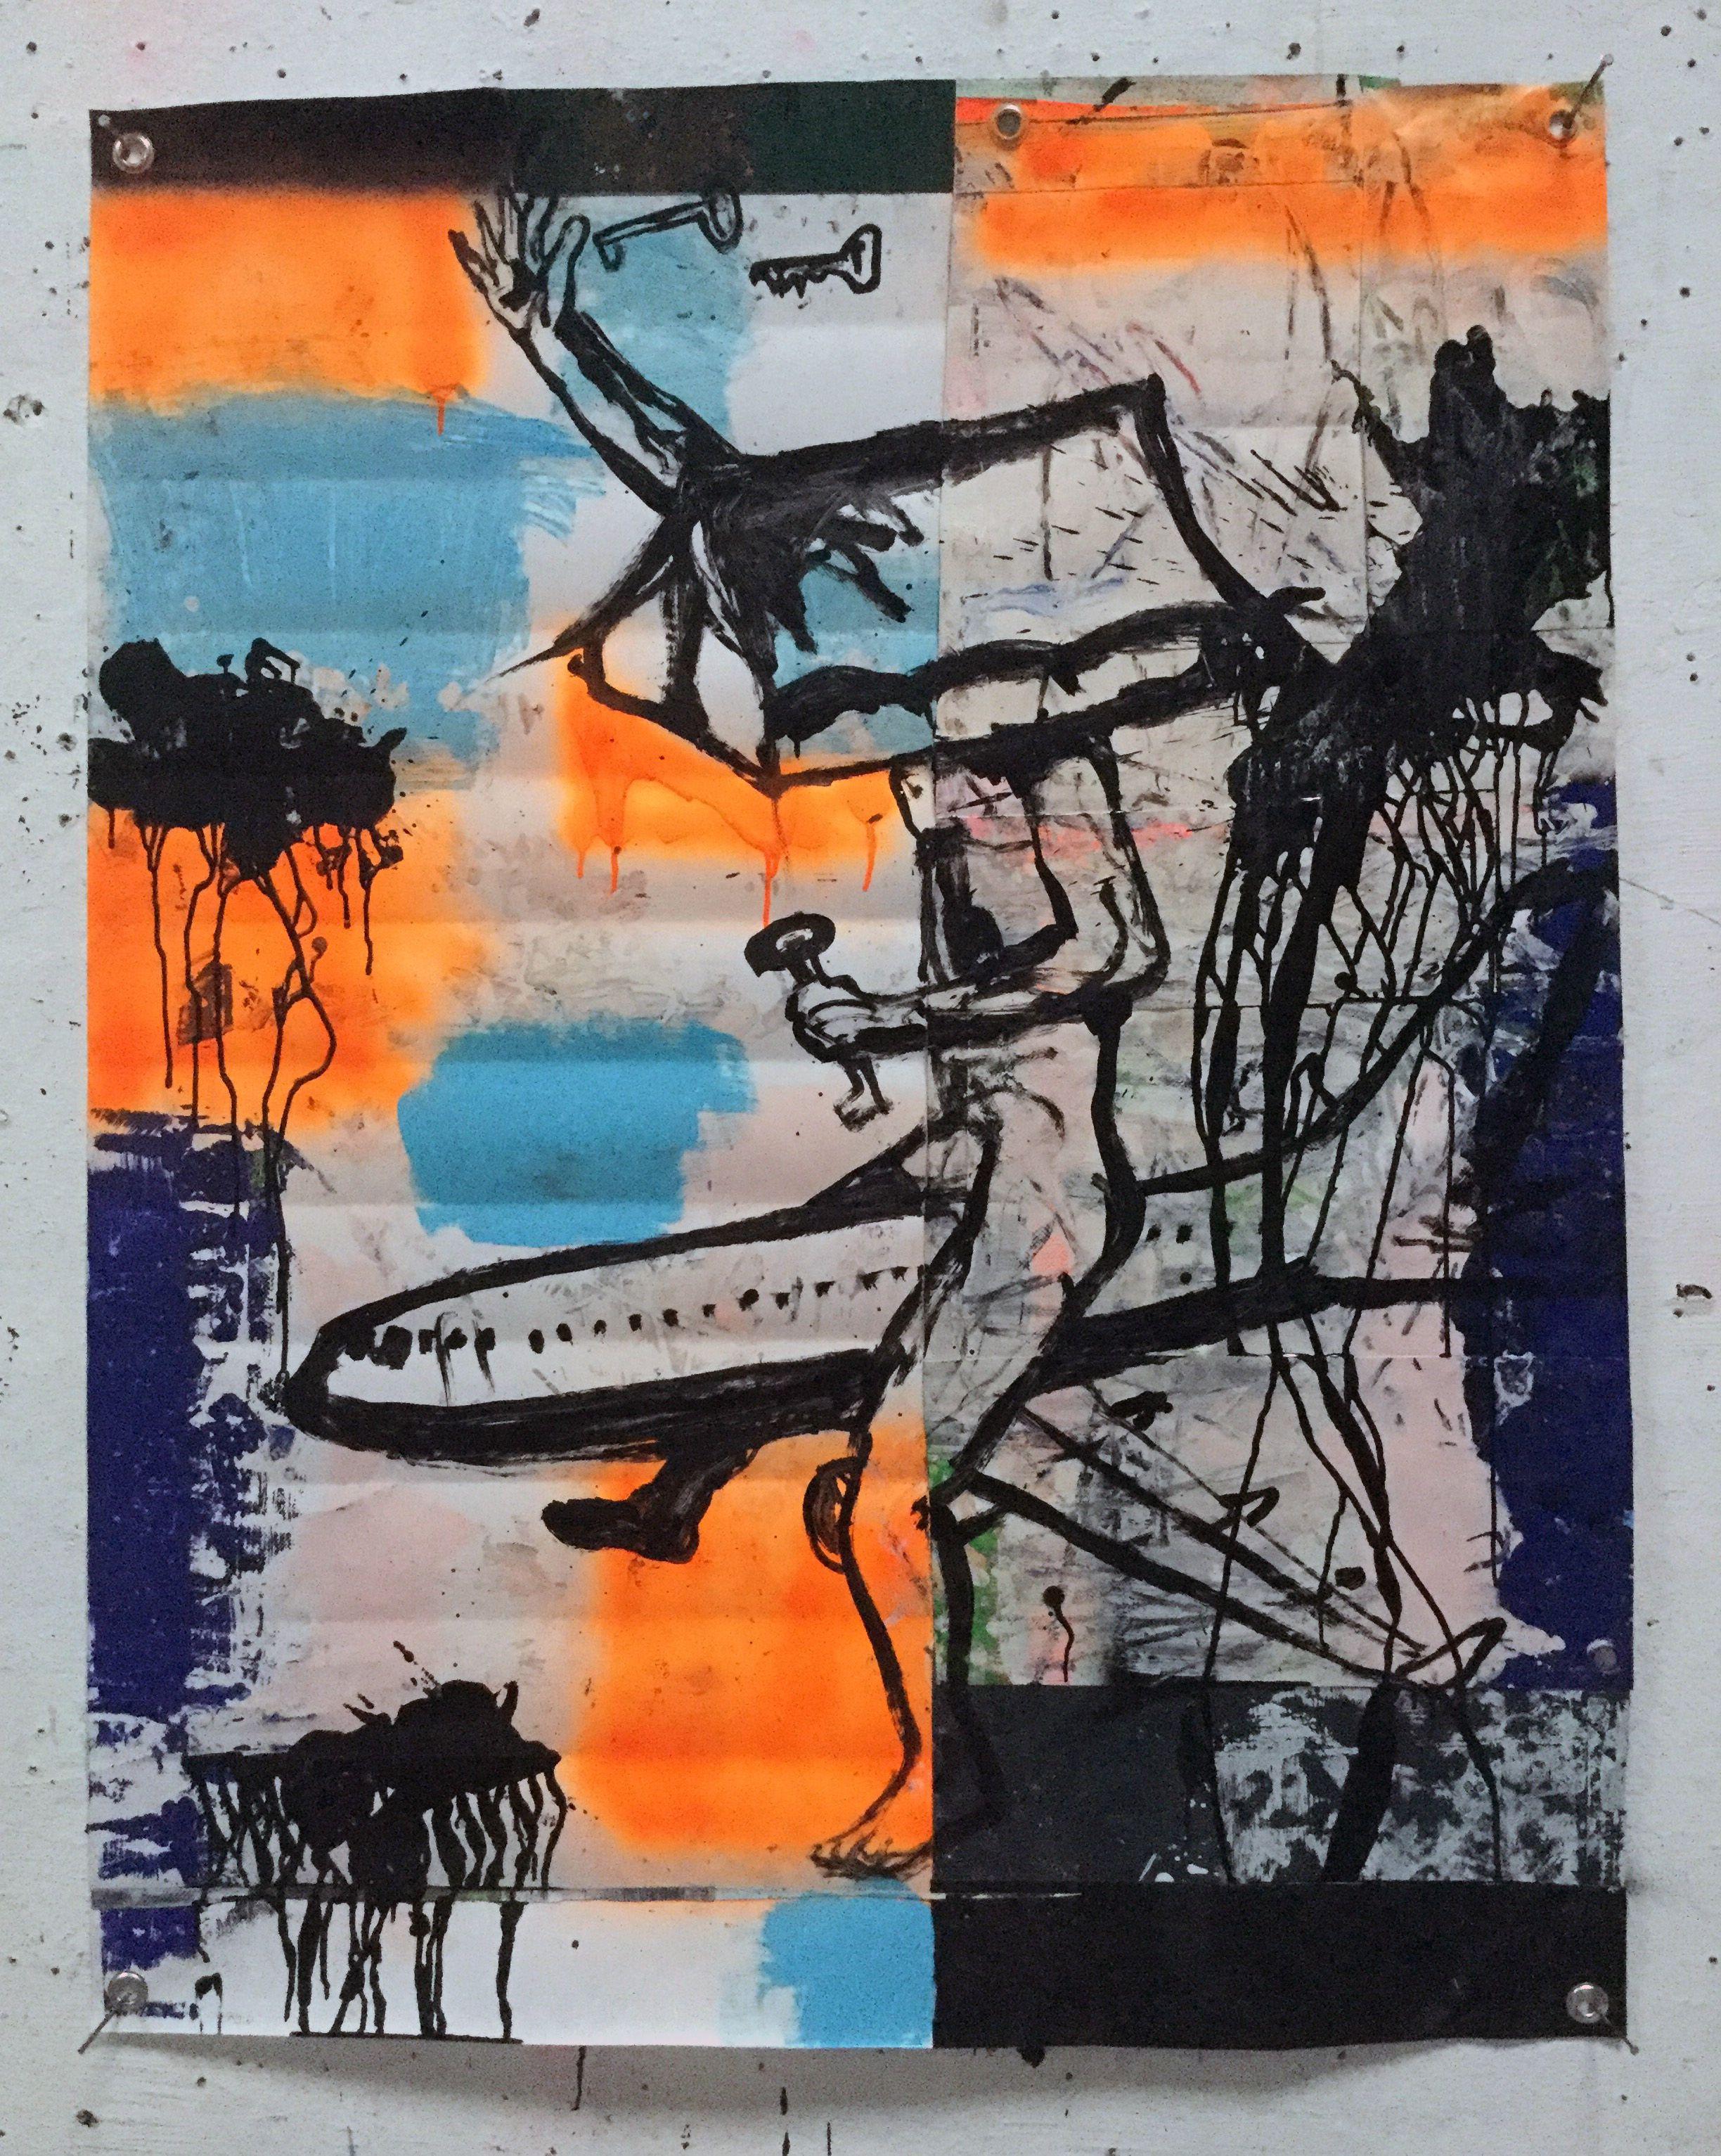 Hermann Josef Hack CLIMATE RIDE, 160129, painting and spray paint on tarpaulin, 129 x 101 cm, 2016